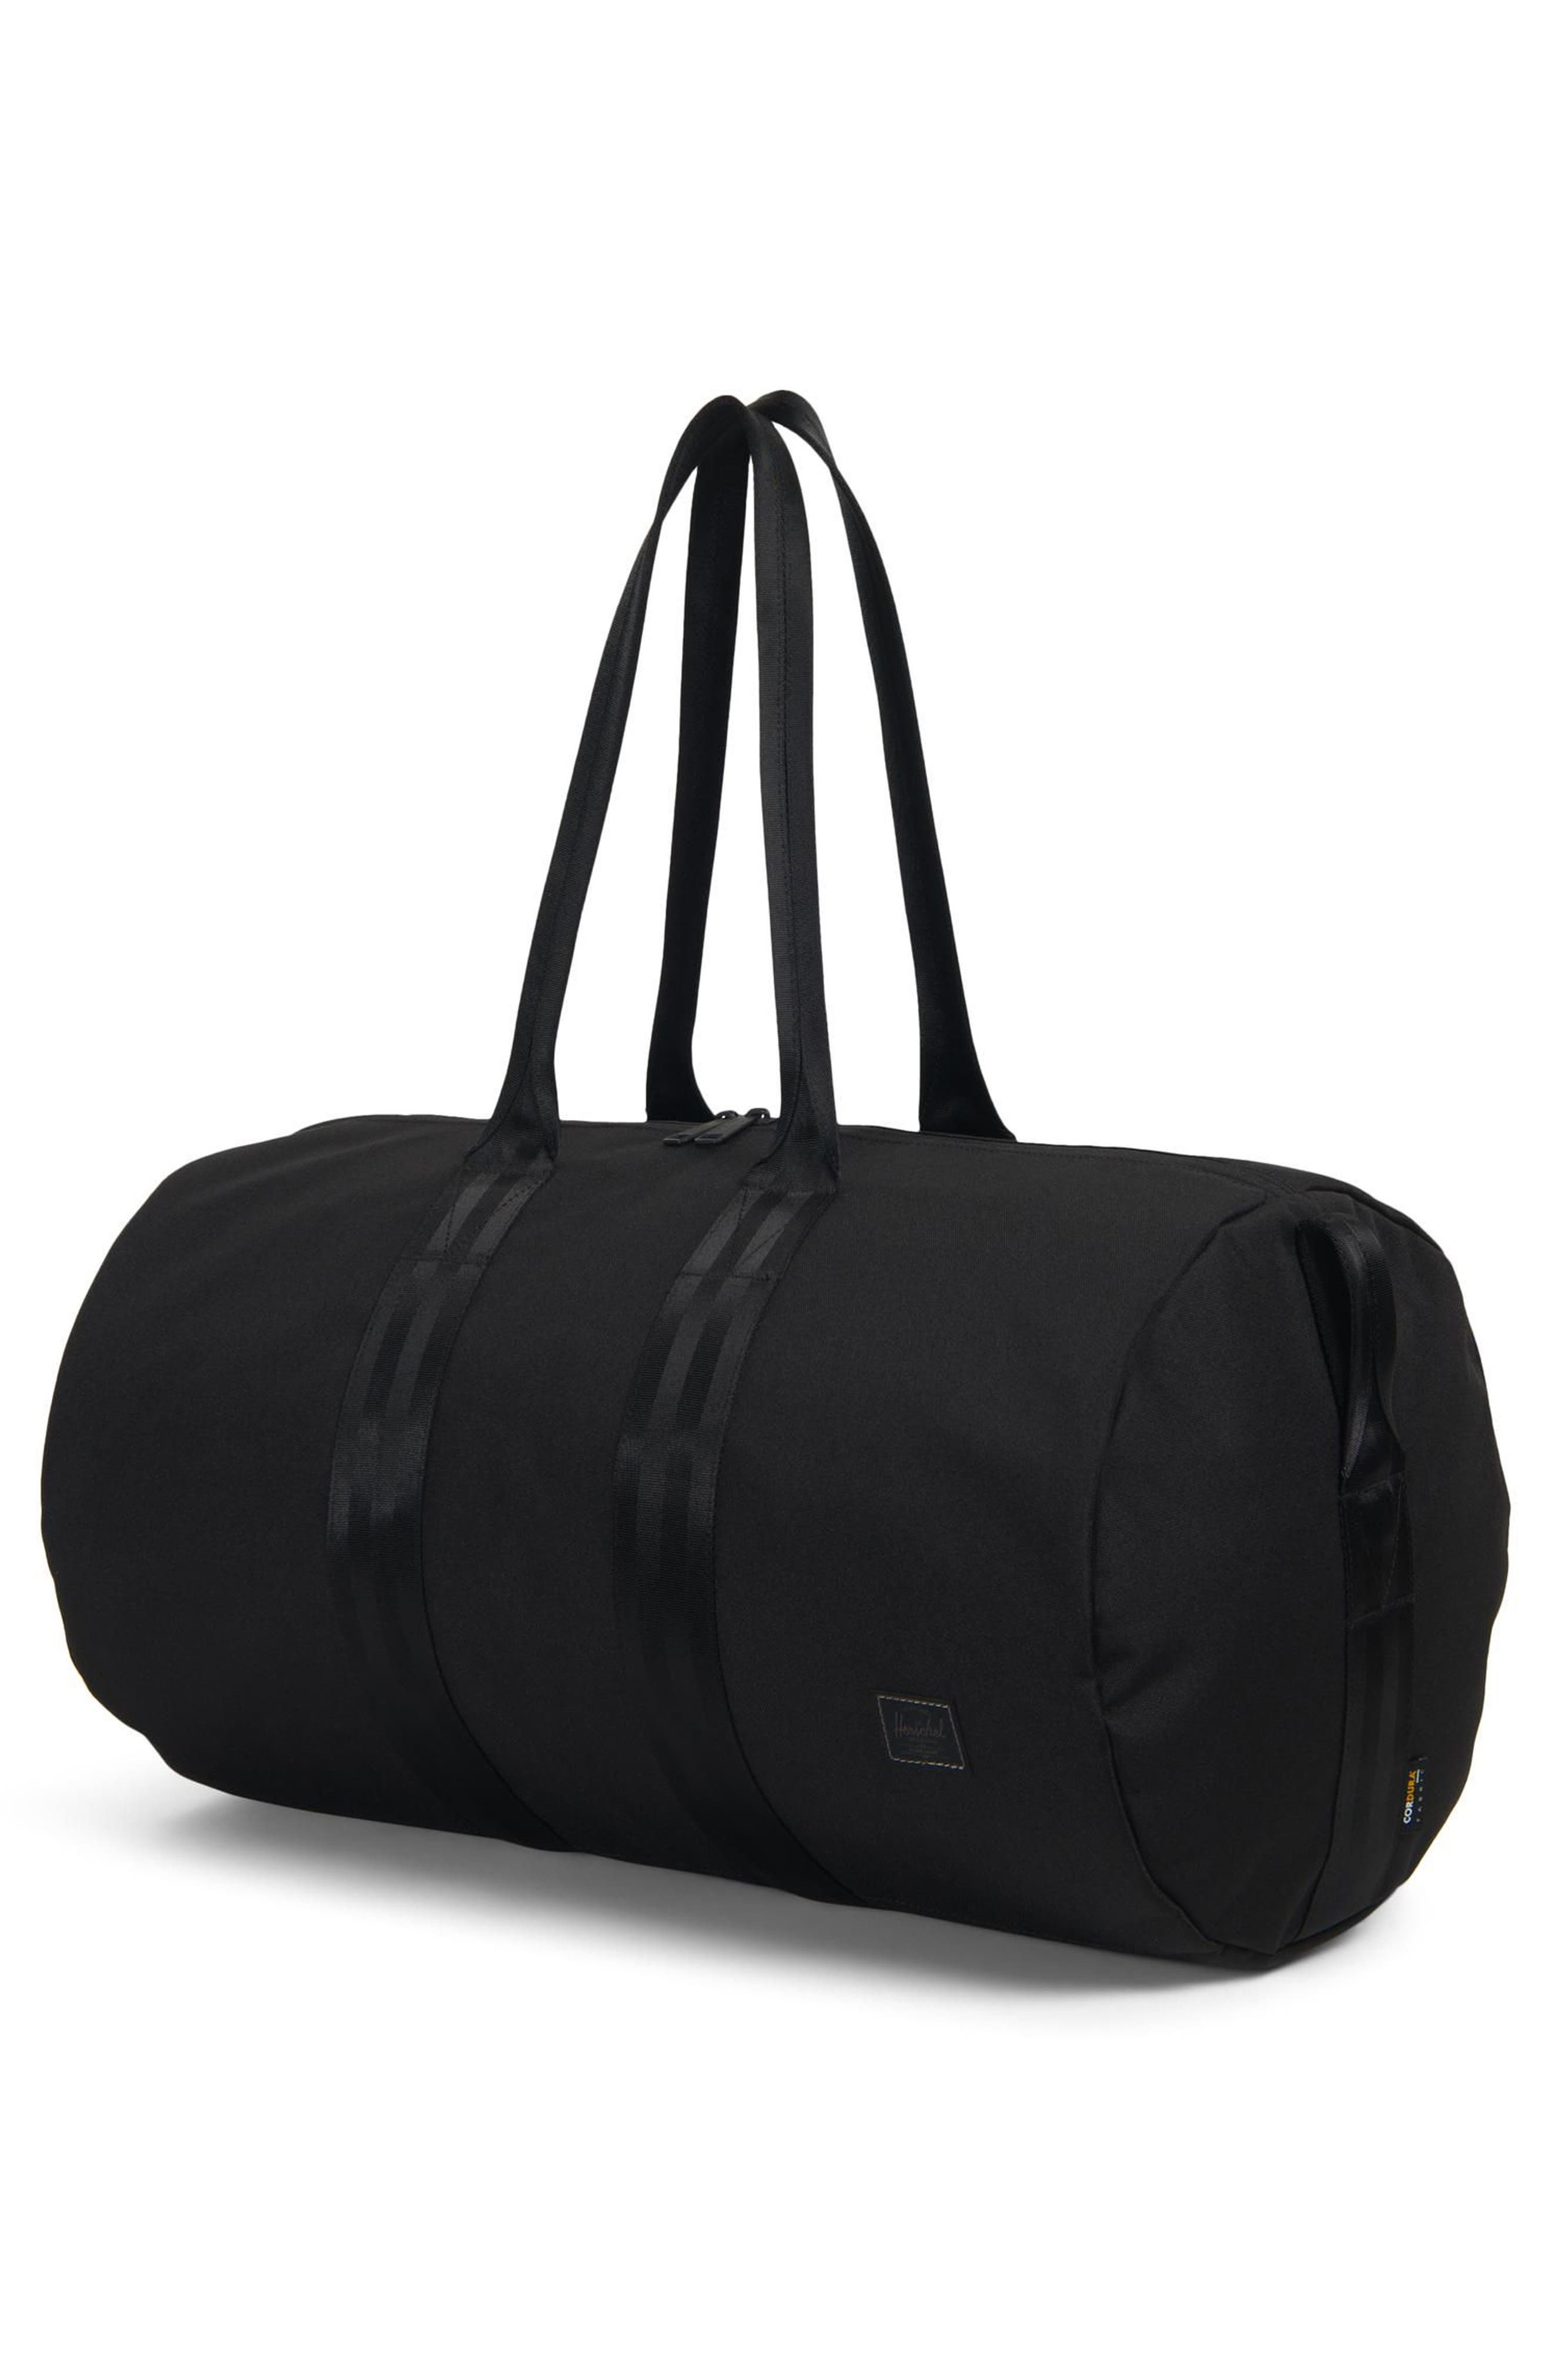 Hayward Duffel Bag,                             Alternate thumbnail 2, color,                             BLACK